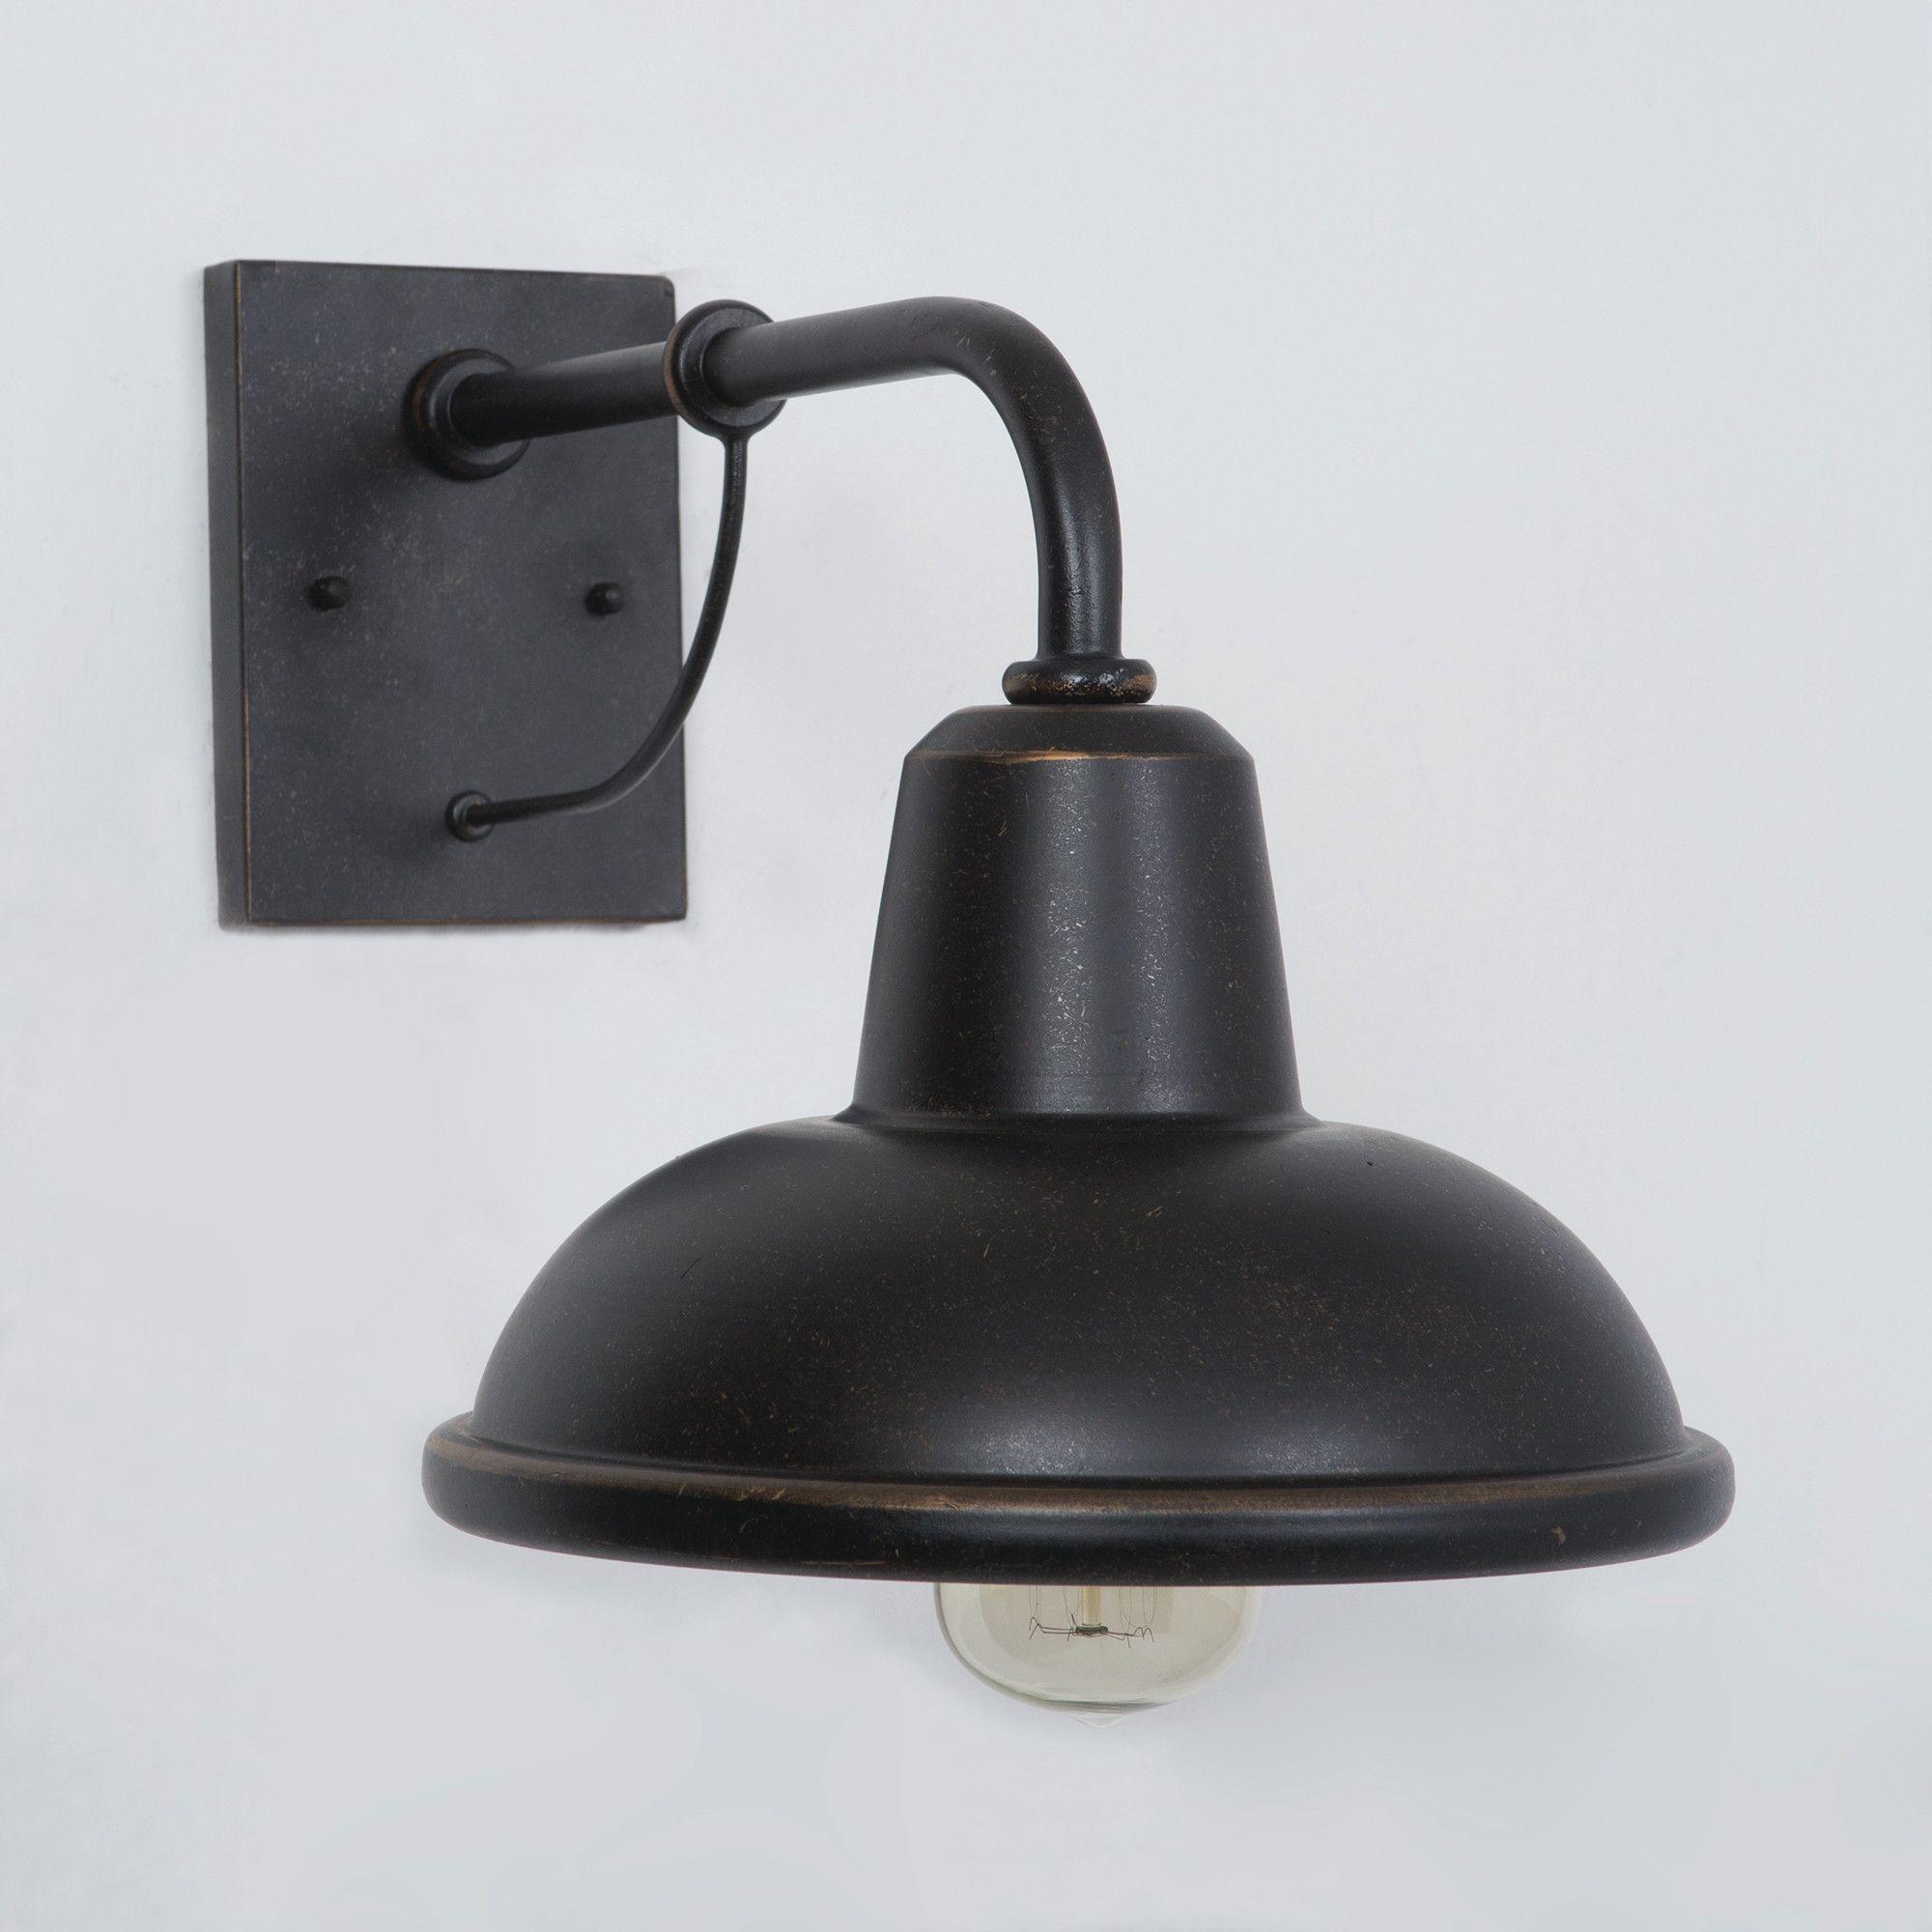 Chloe loft industrial 2 light oil rubbed bronze wall sconce free - Escudilla 1 Light Outdoor Barn Light